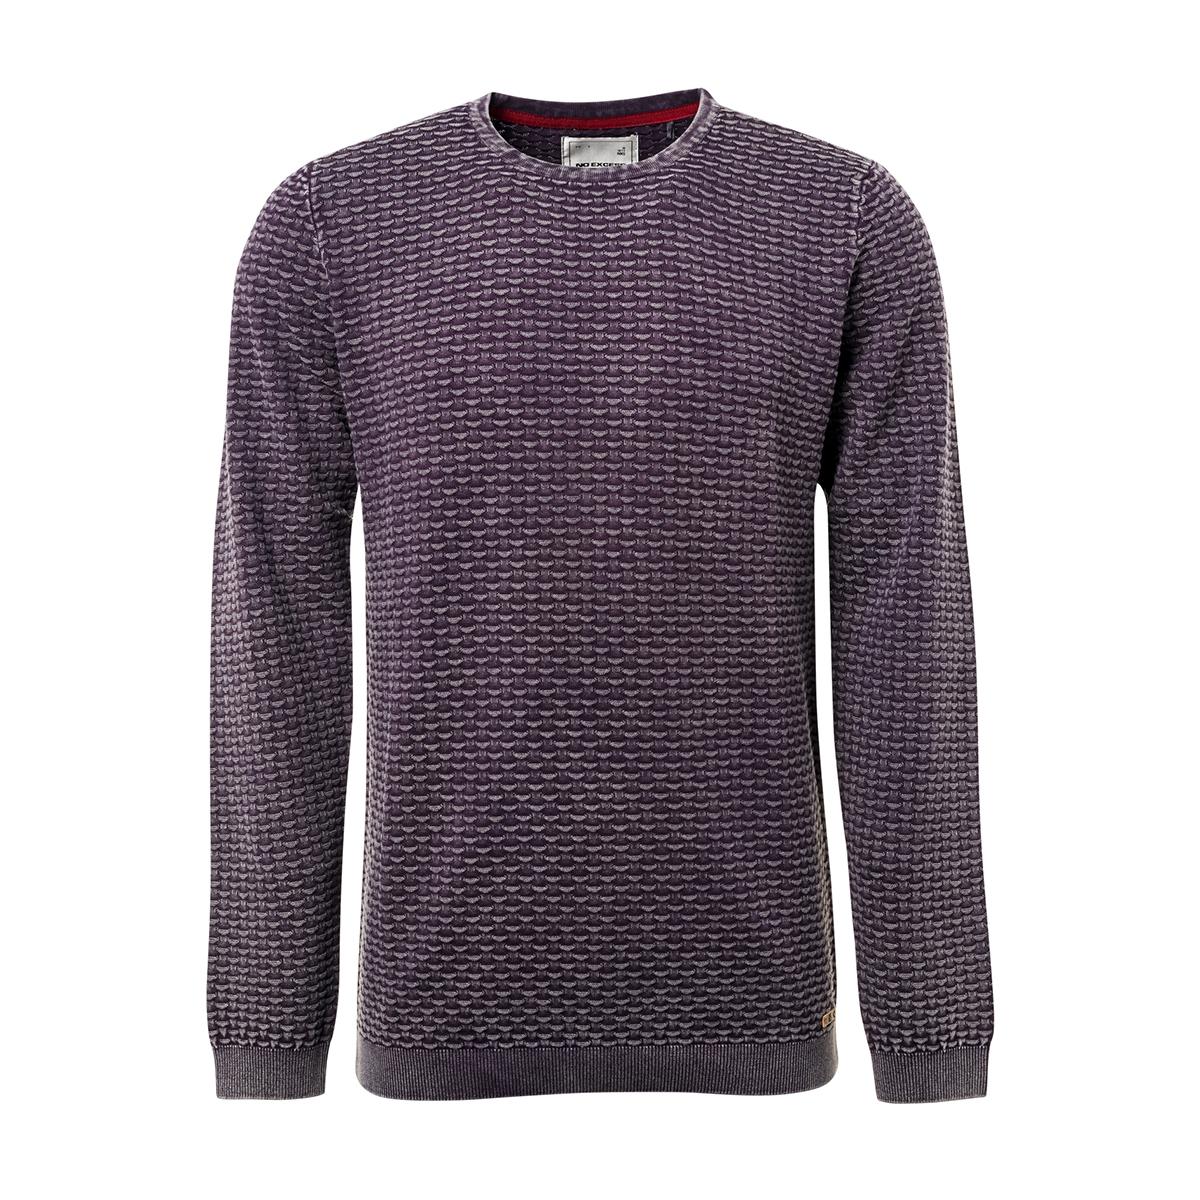 87230908 no-excess trui 080 purple